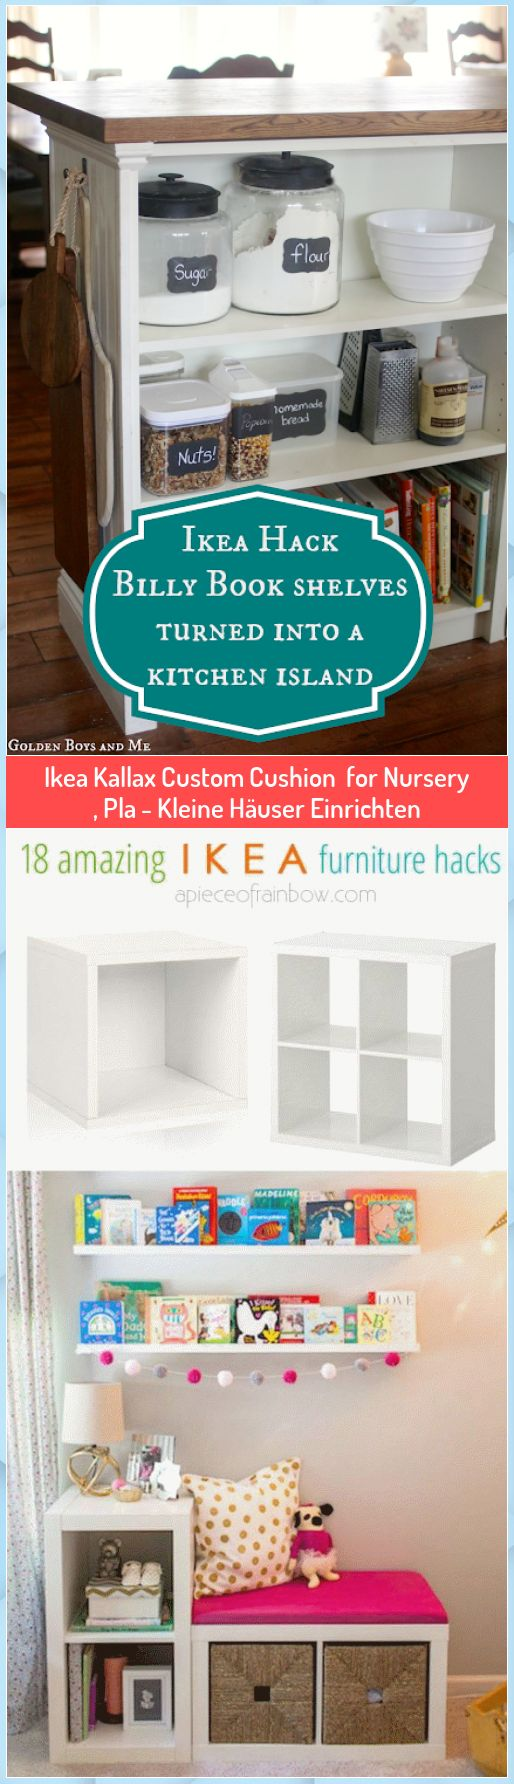 Ikea Kallax Custom Cushion for Nursery , Pla - Kleine ...